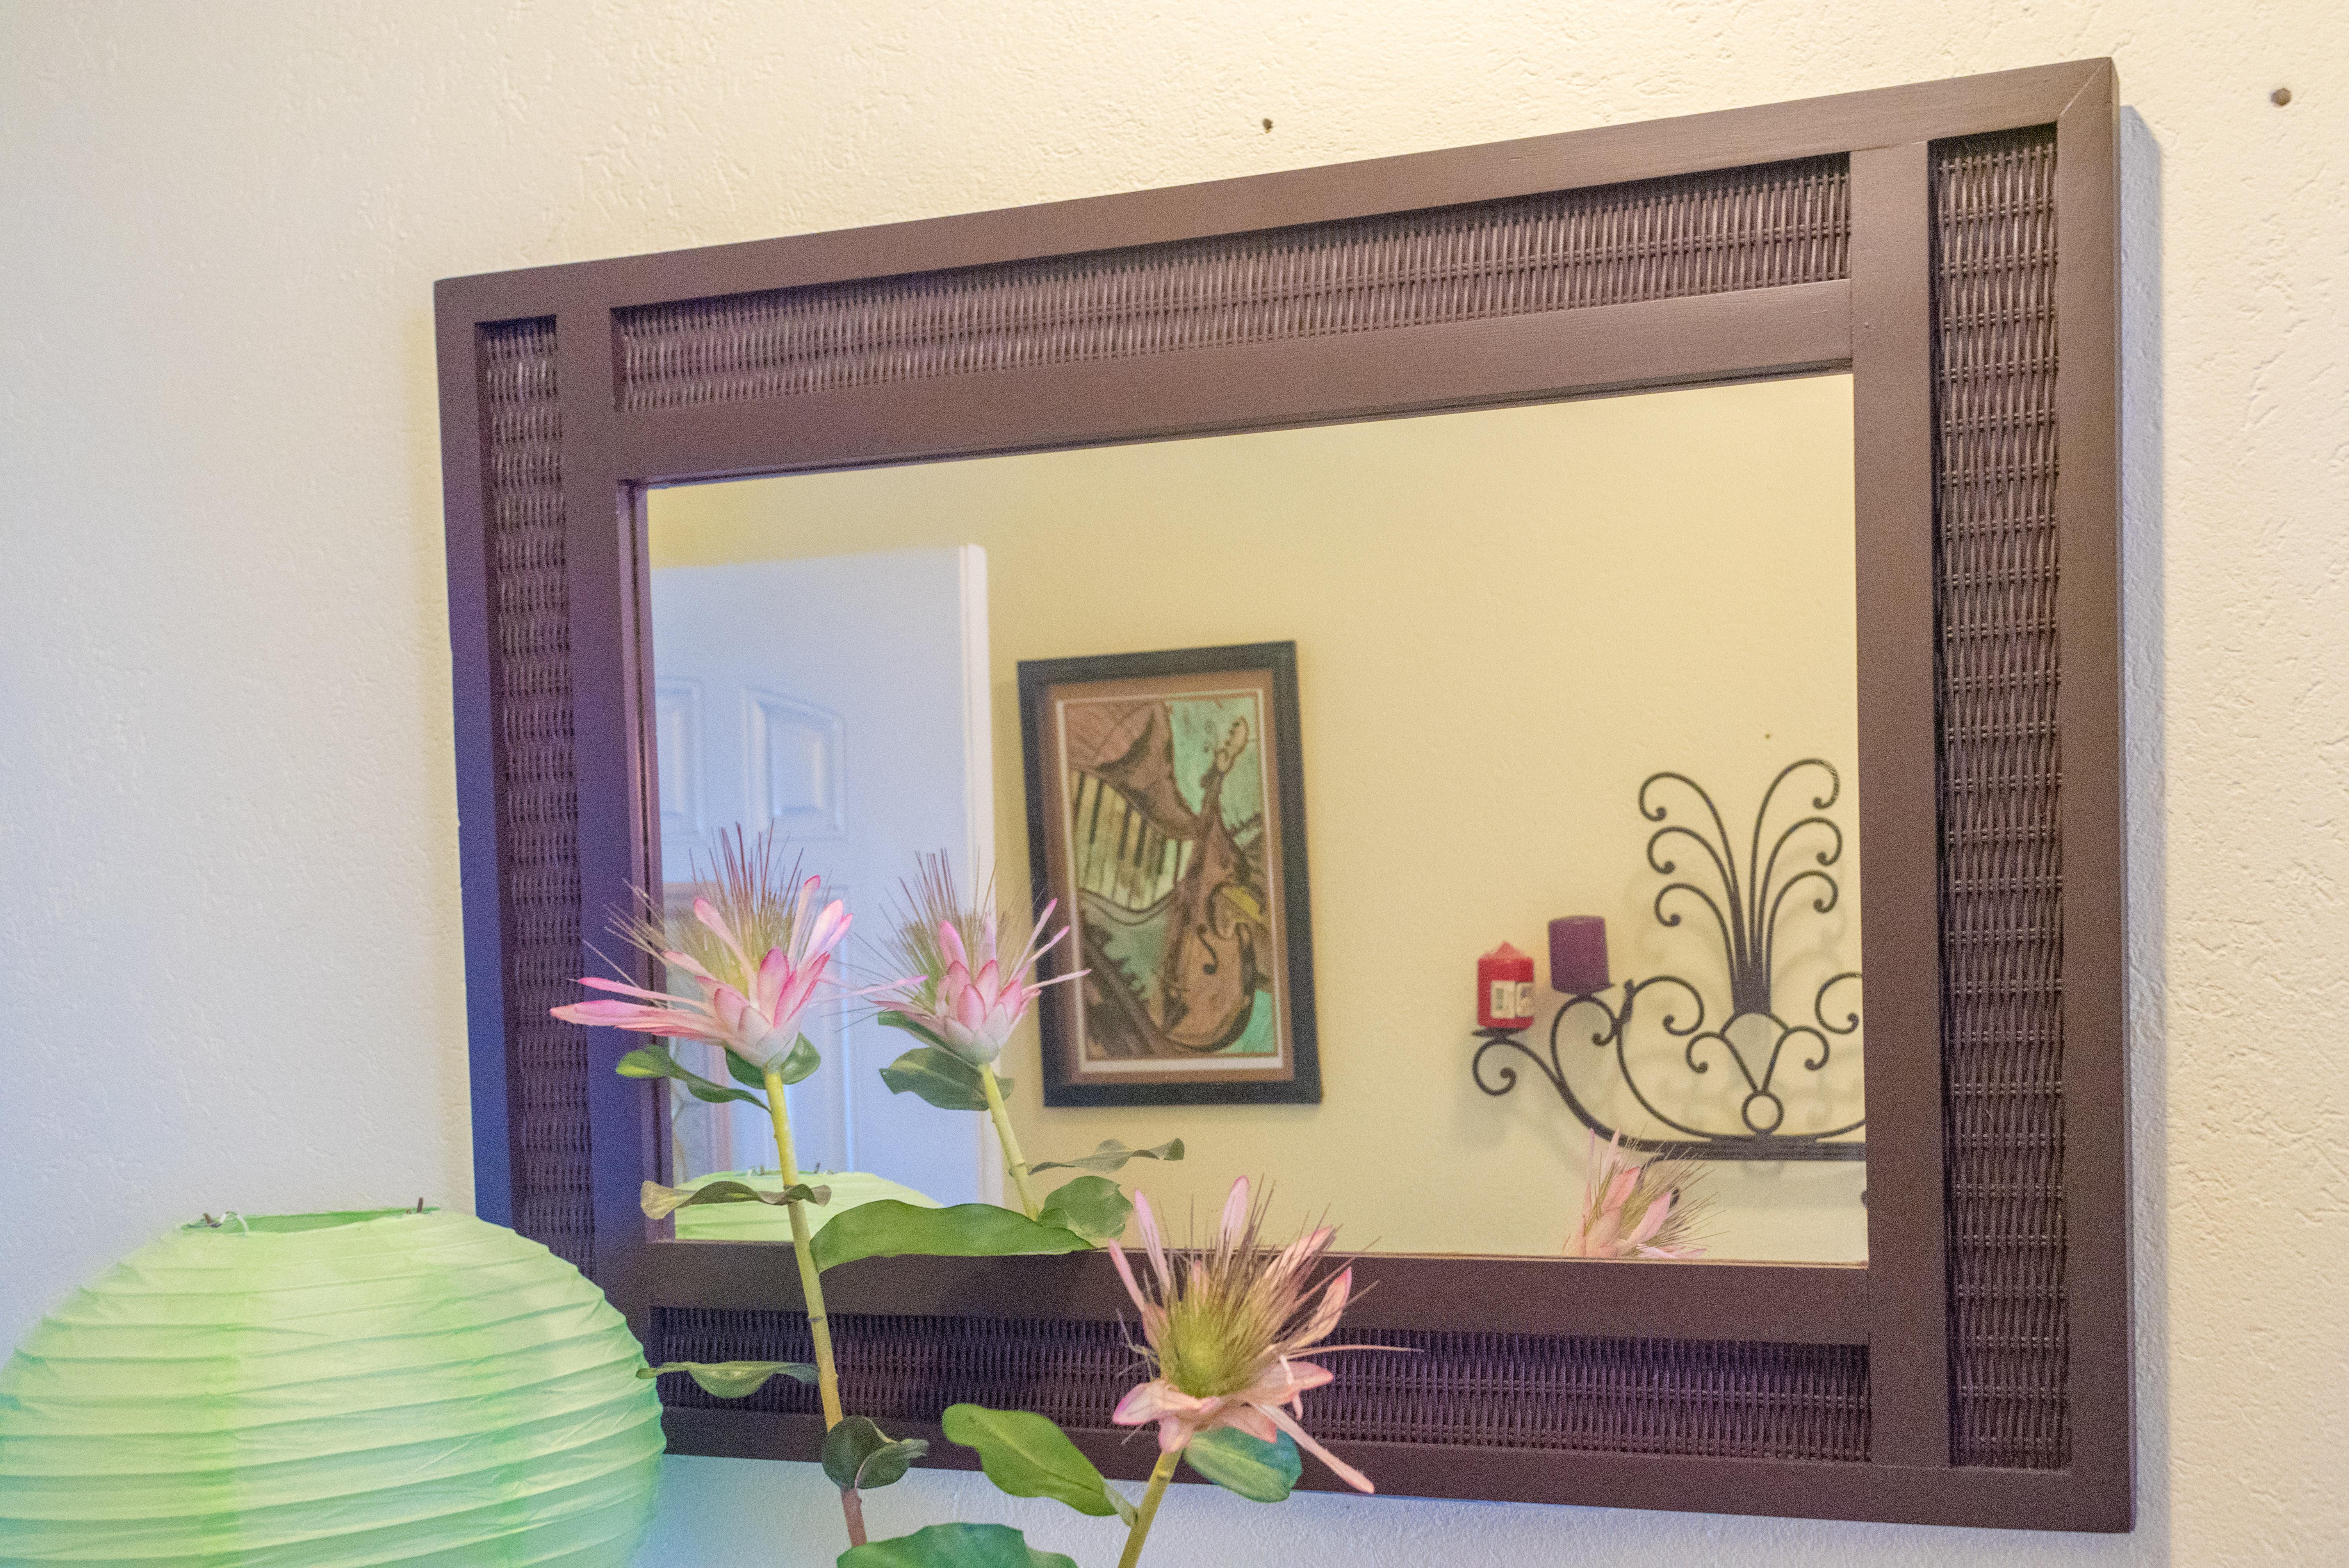 EMERALD LIVING | Hallway decor